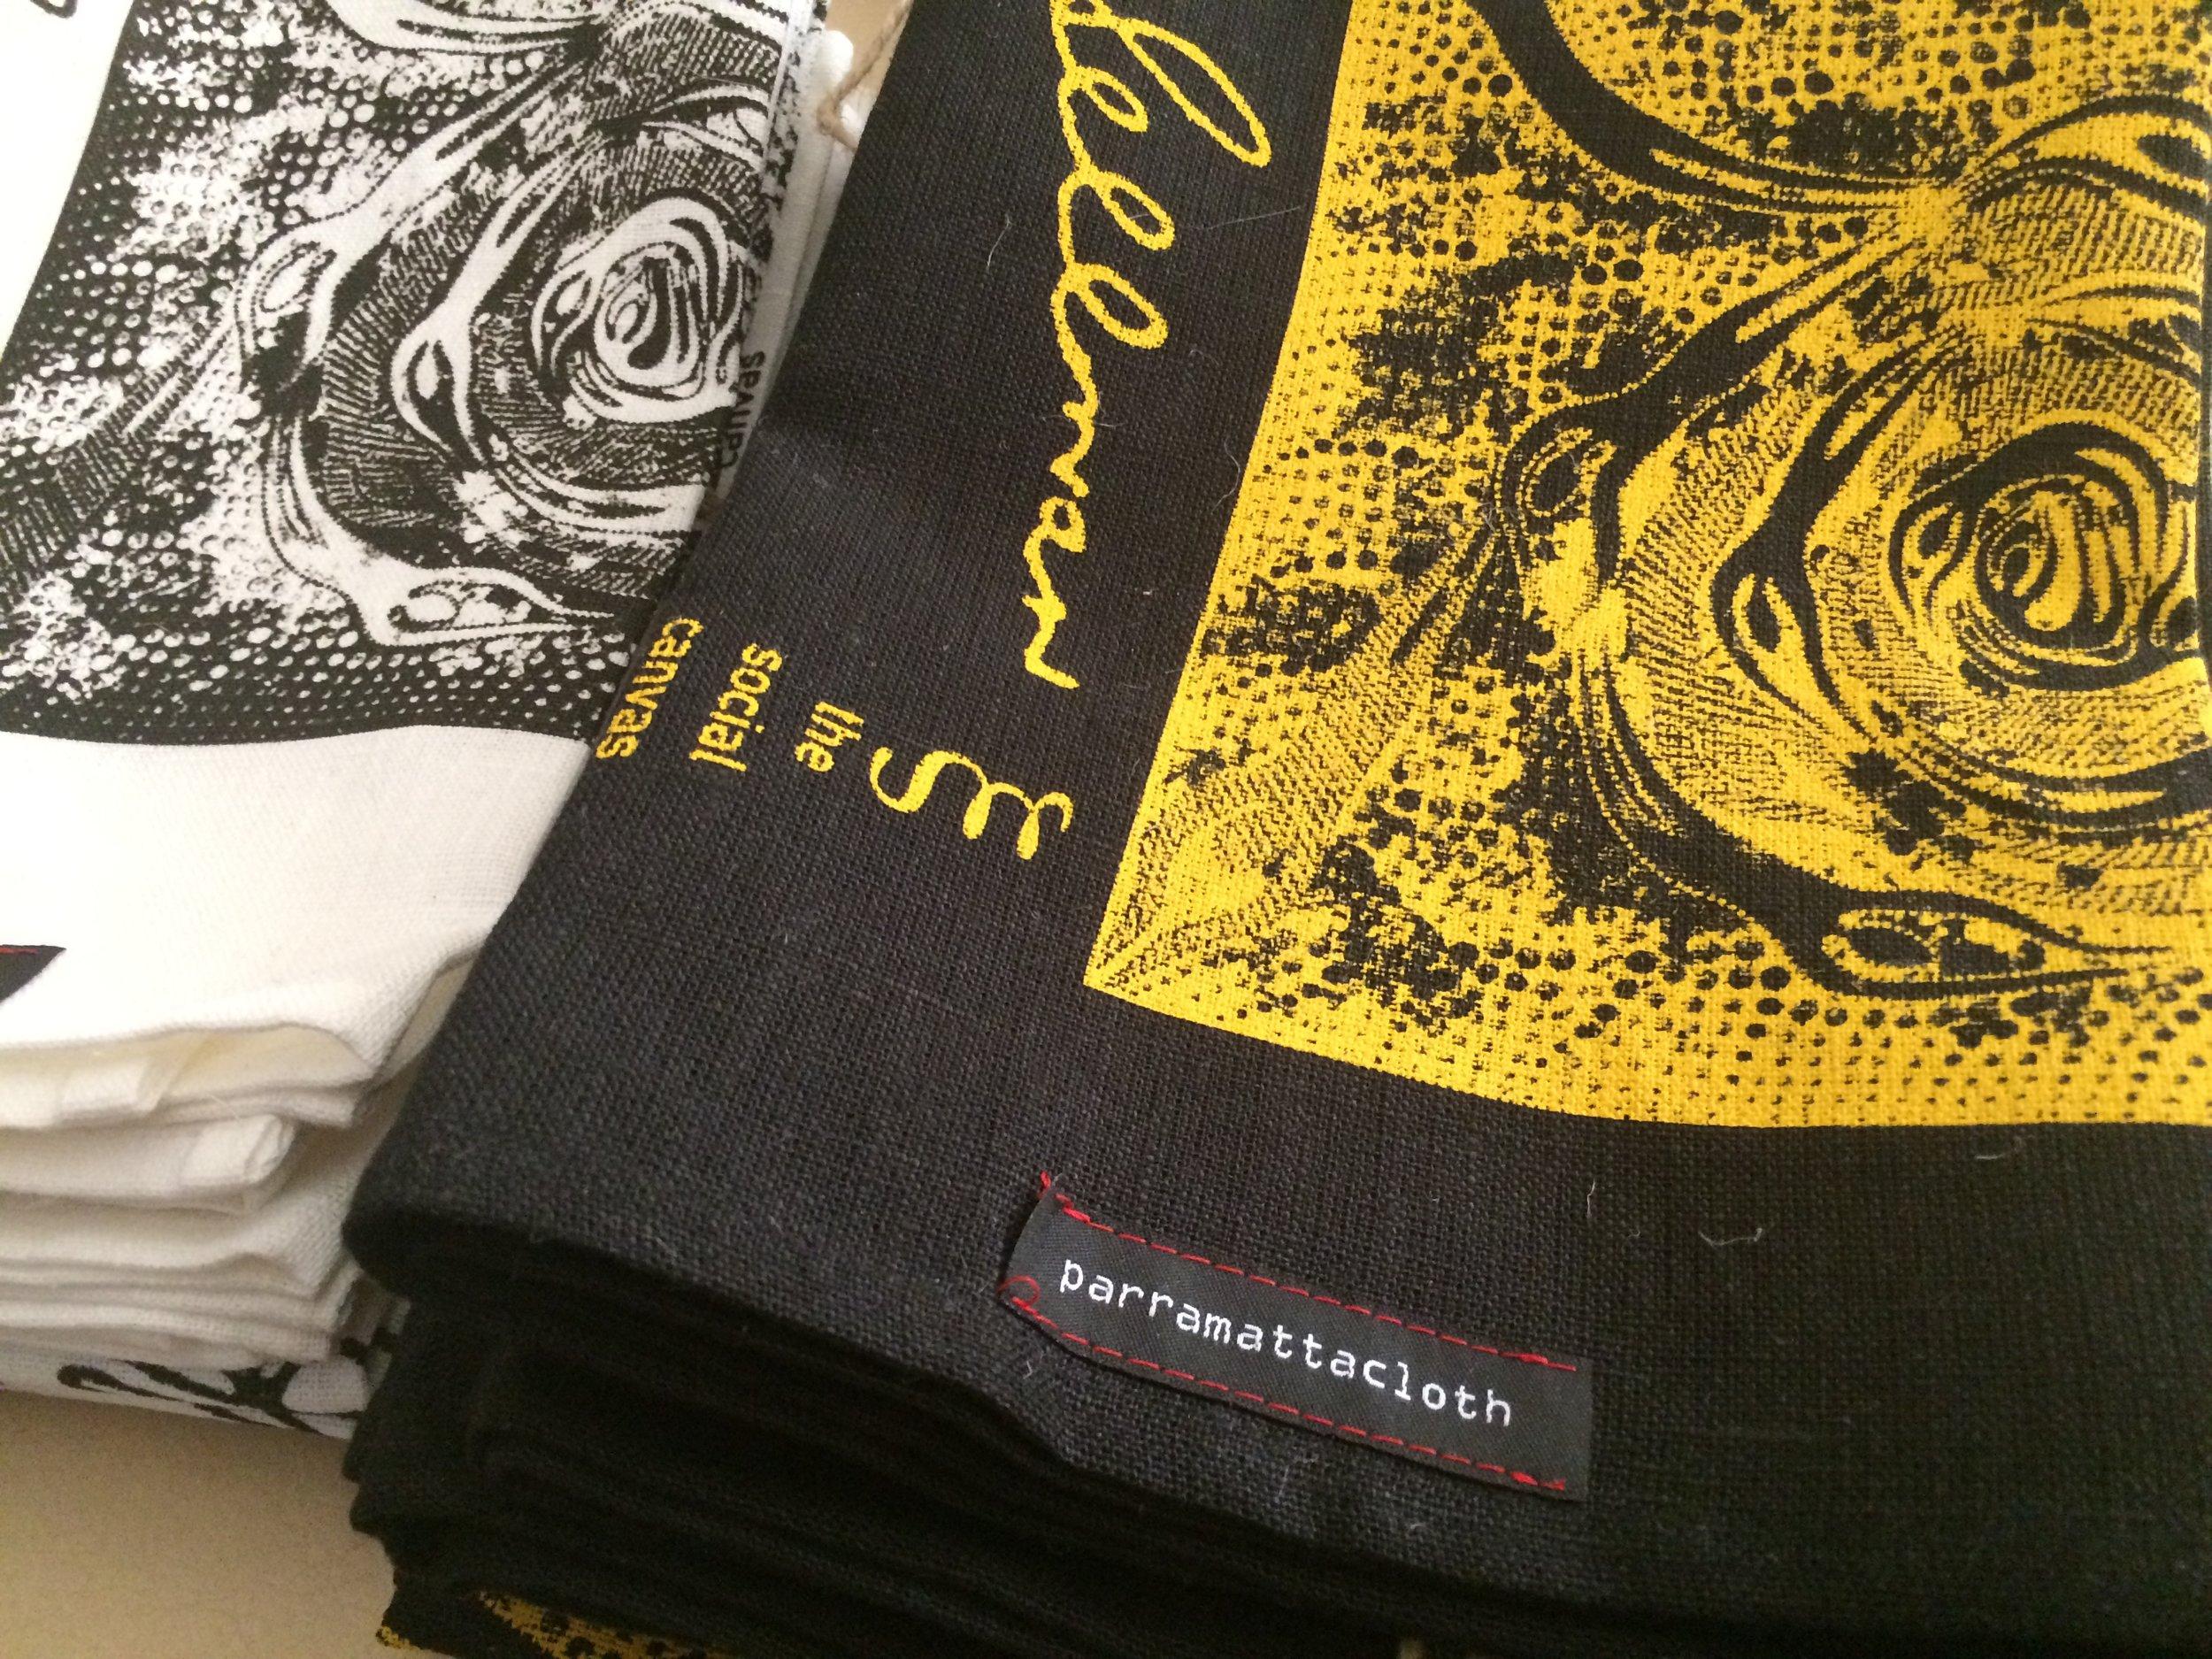 100% flax linen Parramatta Cloth in black or natural off-white.